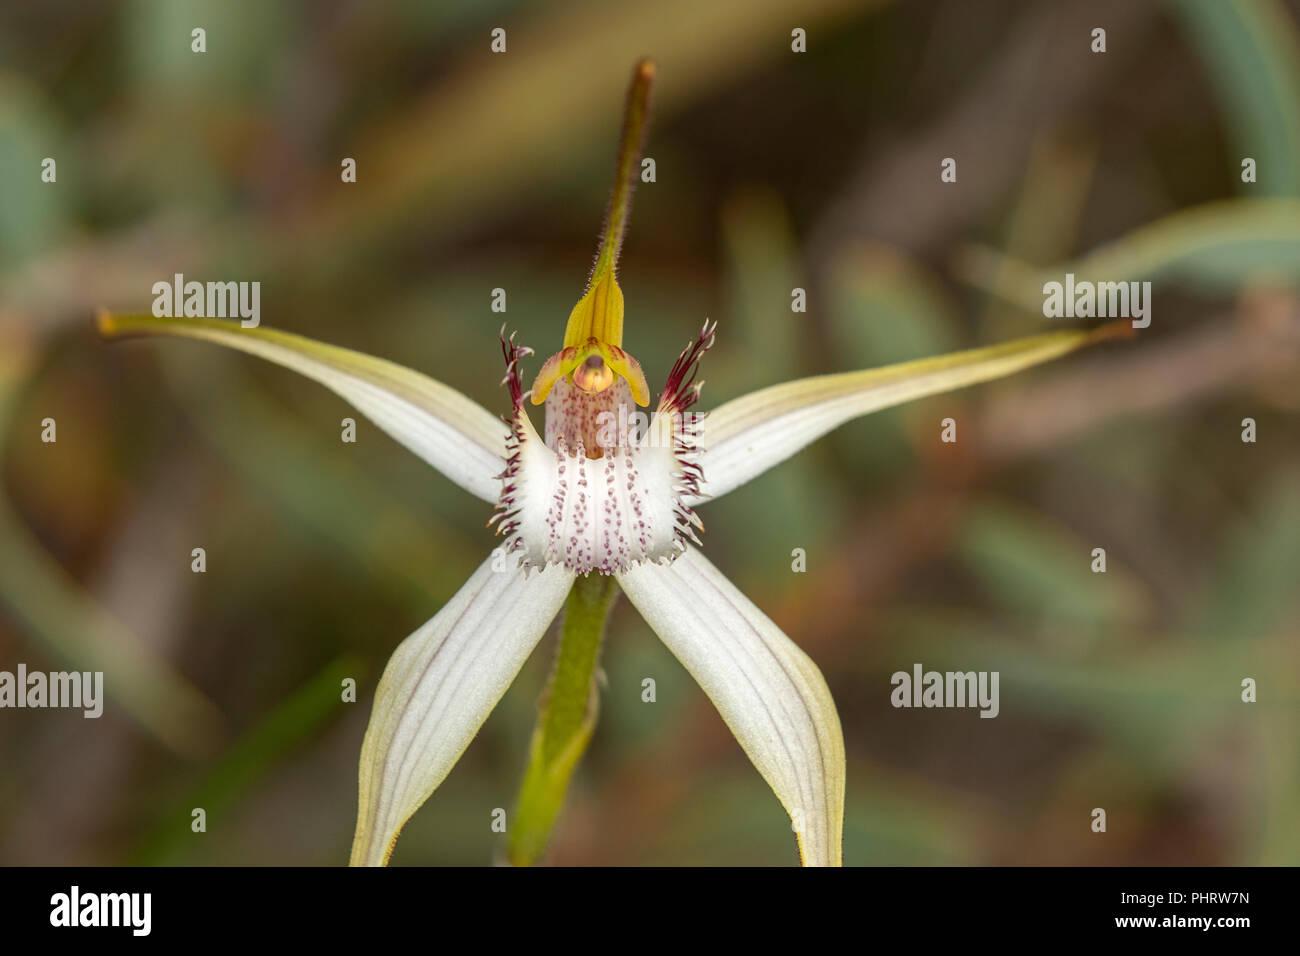 Caladenia longicauda ssp. eminems, Stark White Spider Orchid - Stock Image